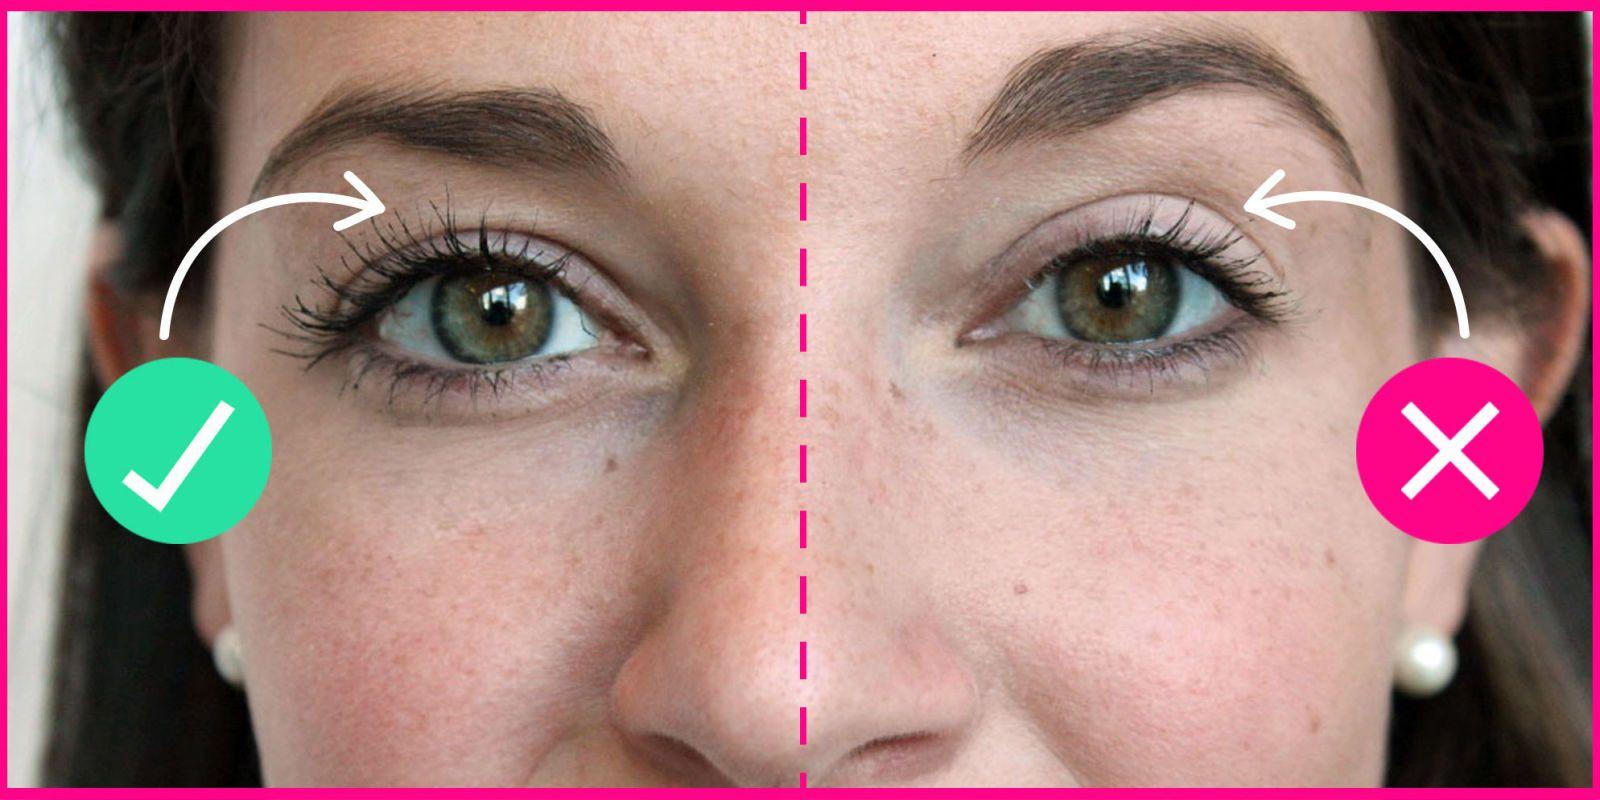 16 Eye Makeup Tips You Need to Know \u2014 Easy Eye Makeup Tricks